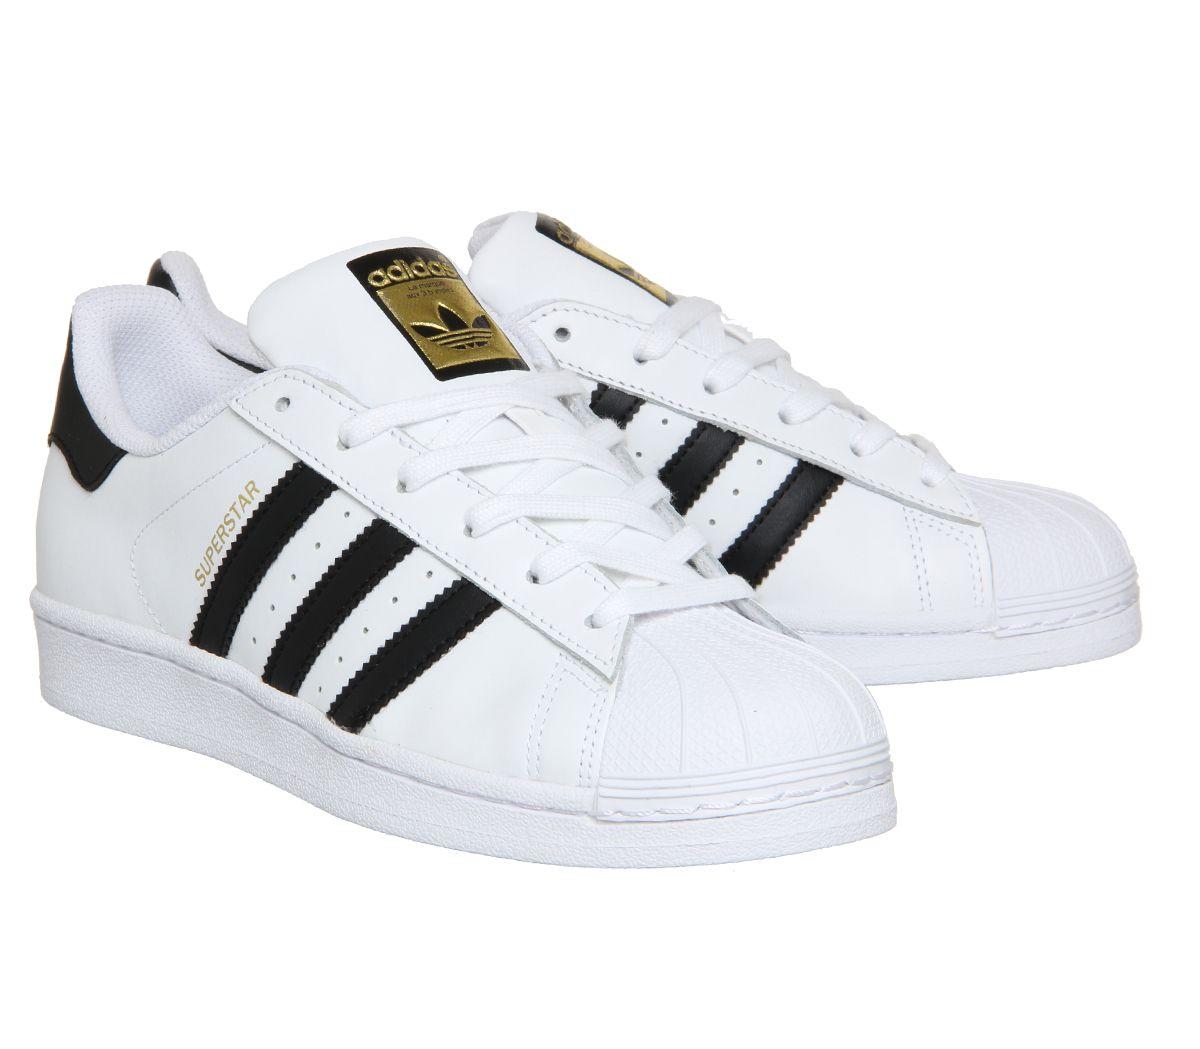 adidas superstar scarpe prezzo